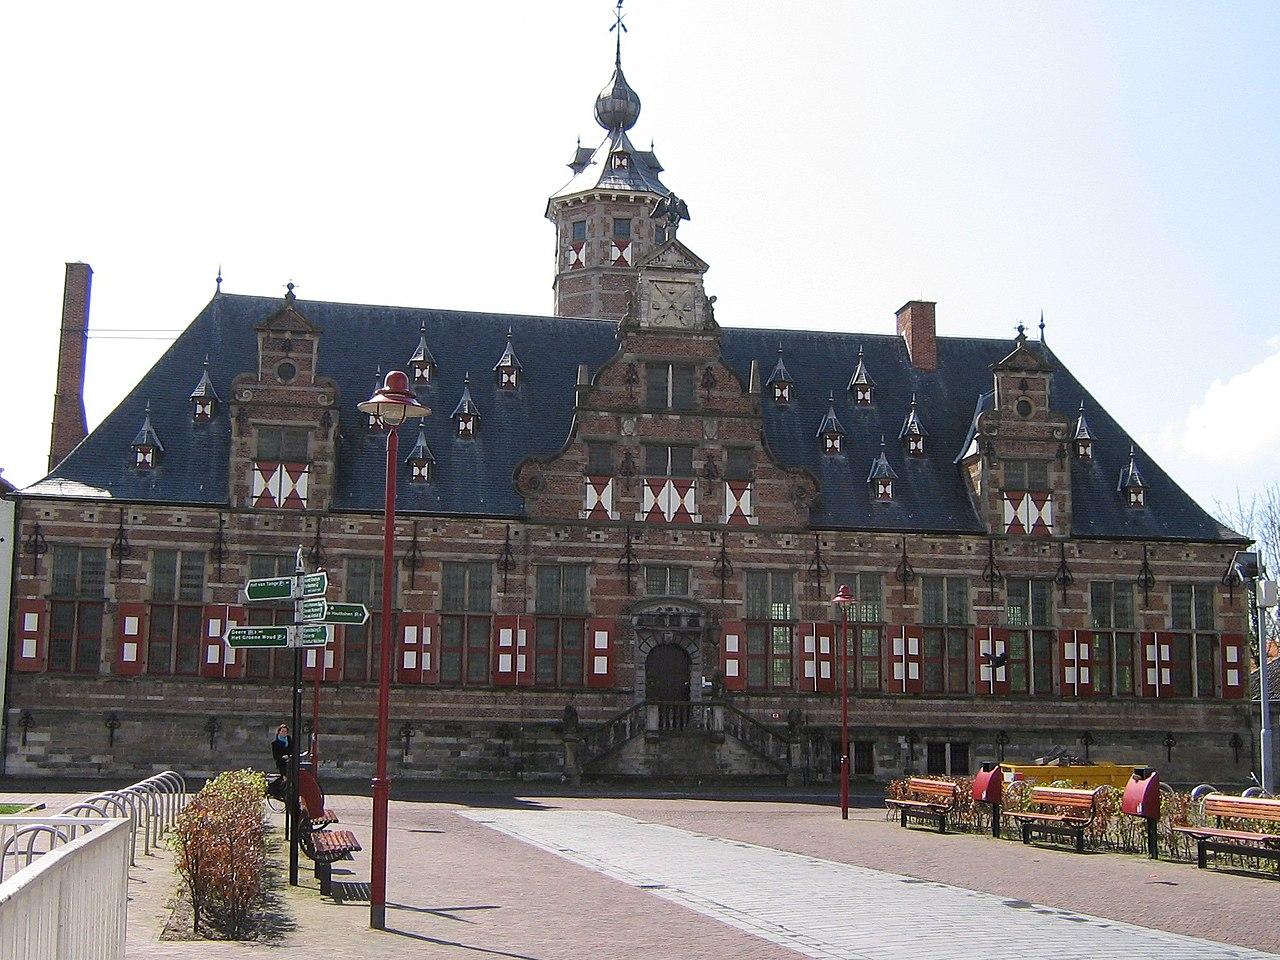 Middelburg's Kloveniersdoelen